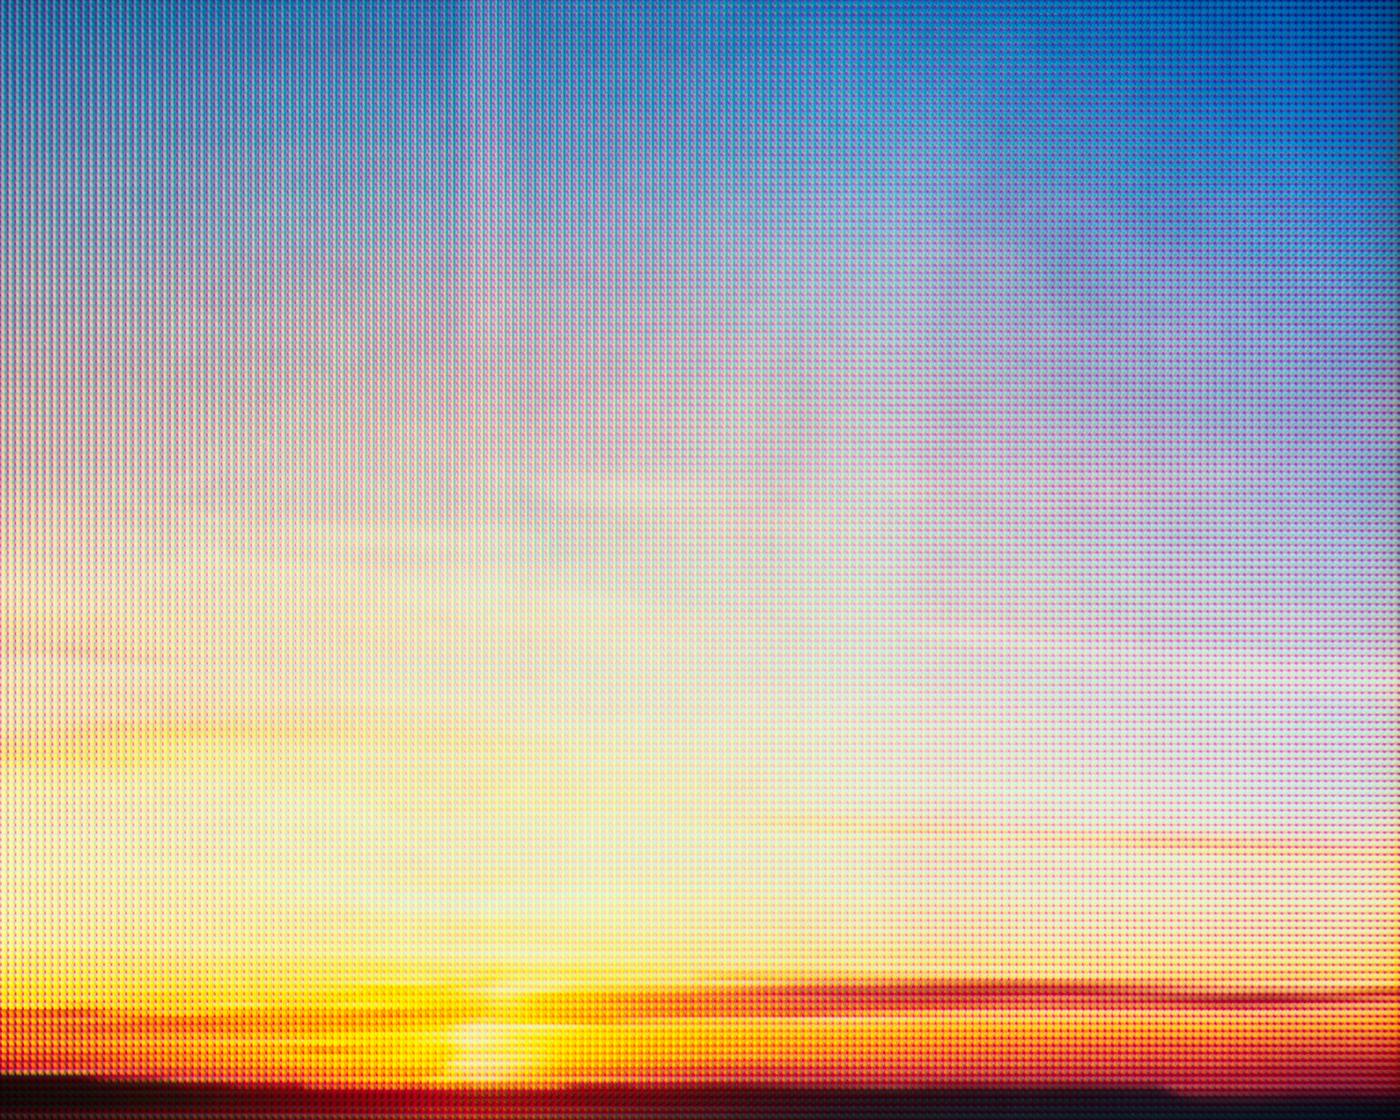 sg_sunset_33.jpg